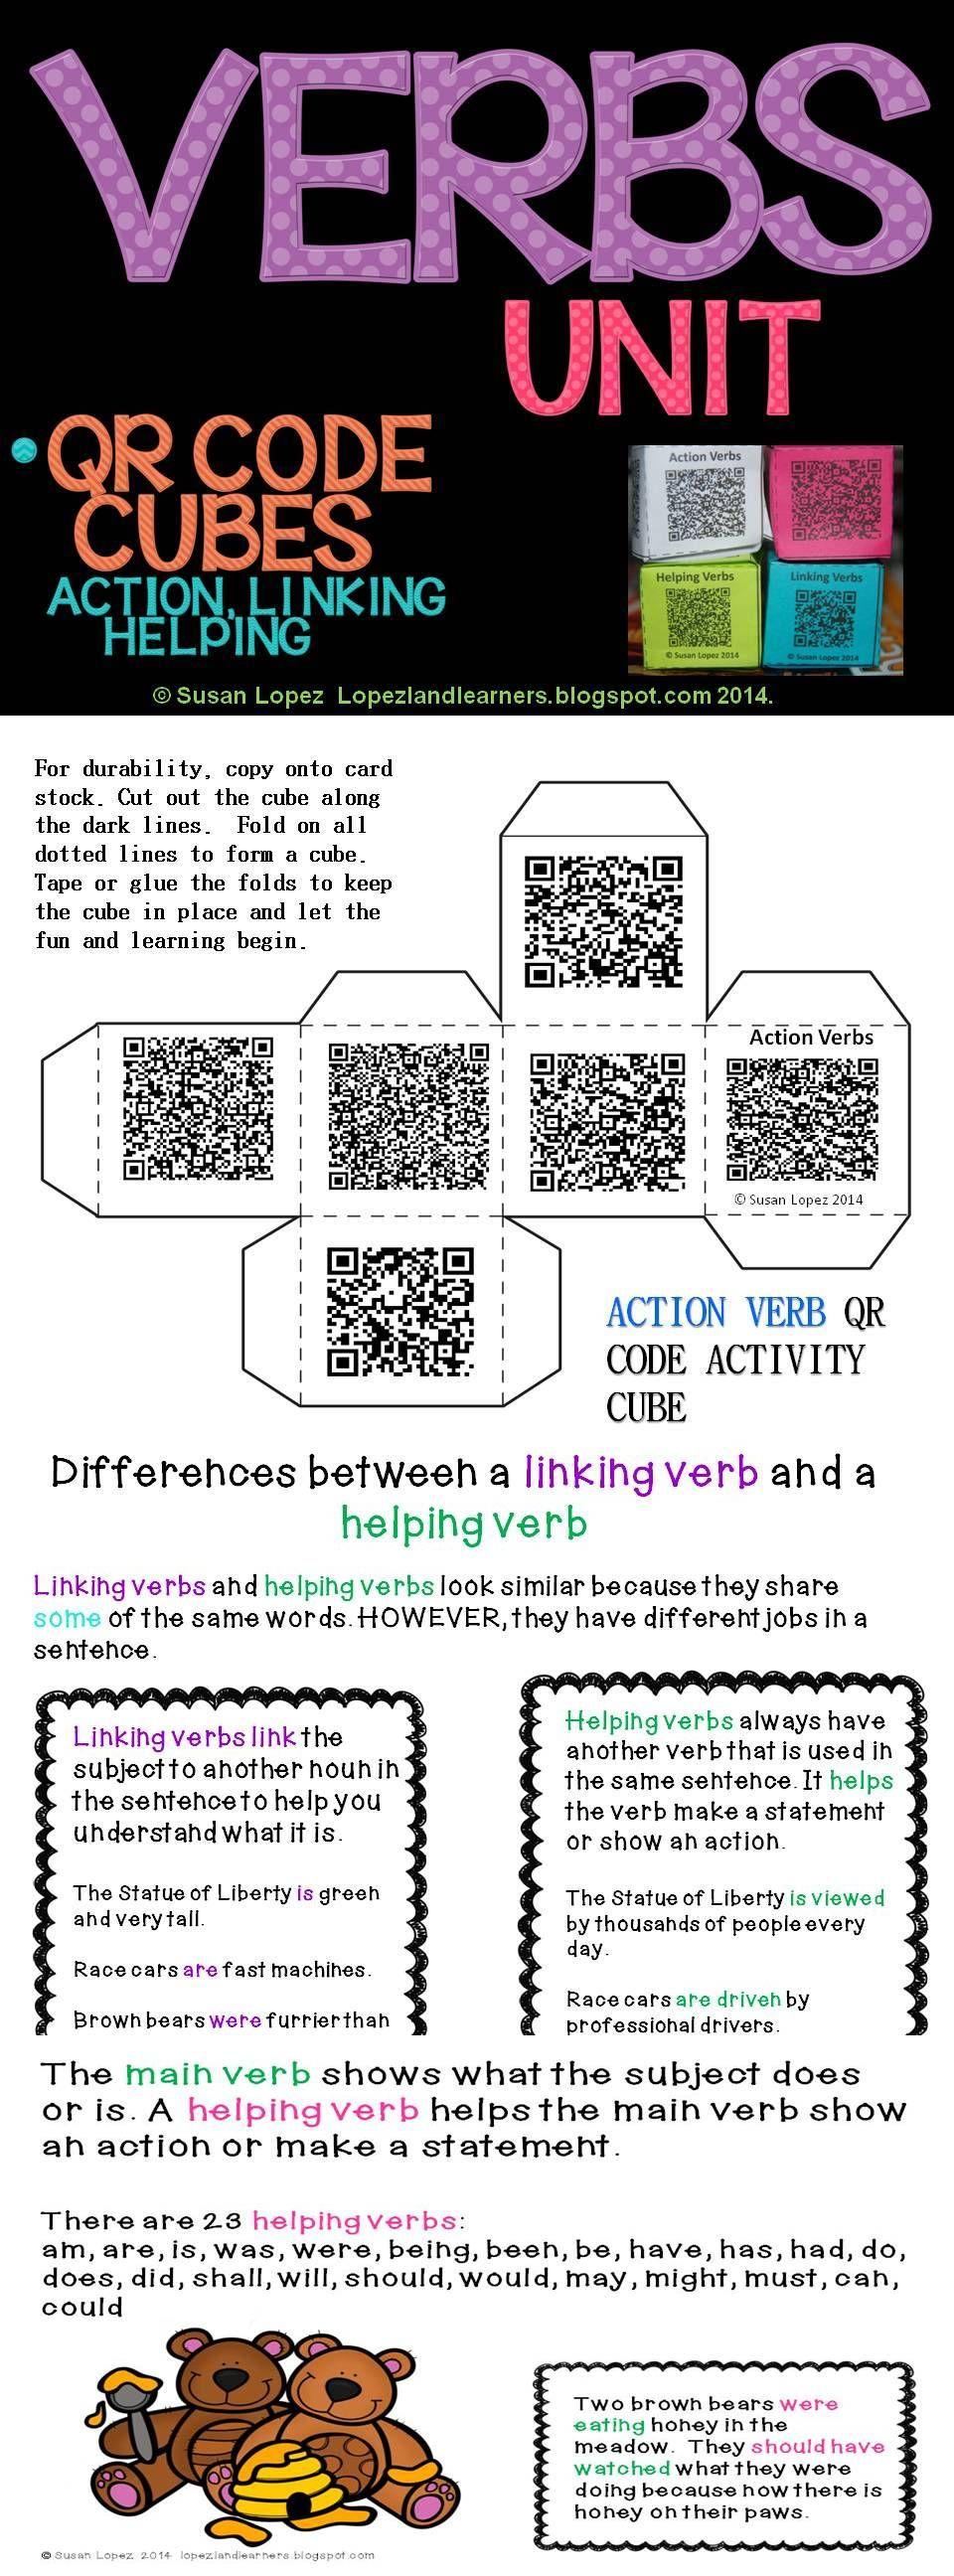 Verbs Qr Code Writing Activity Cubes Verb Examples Linking Verbs